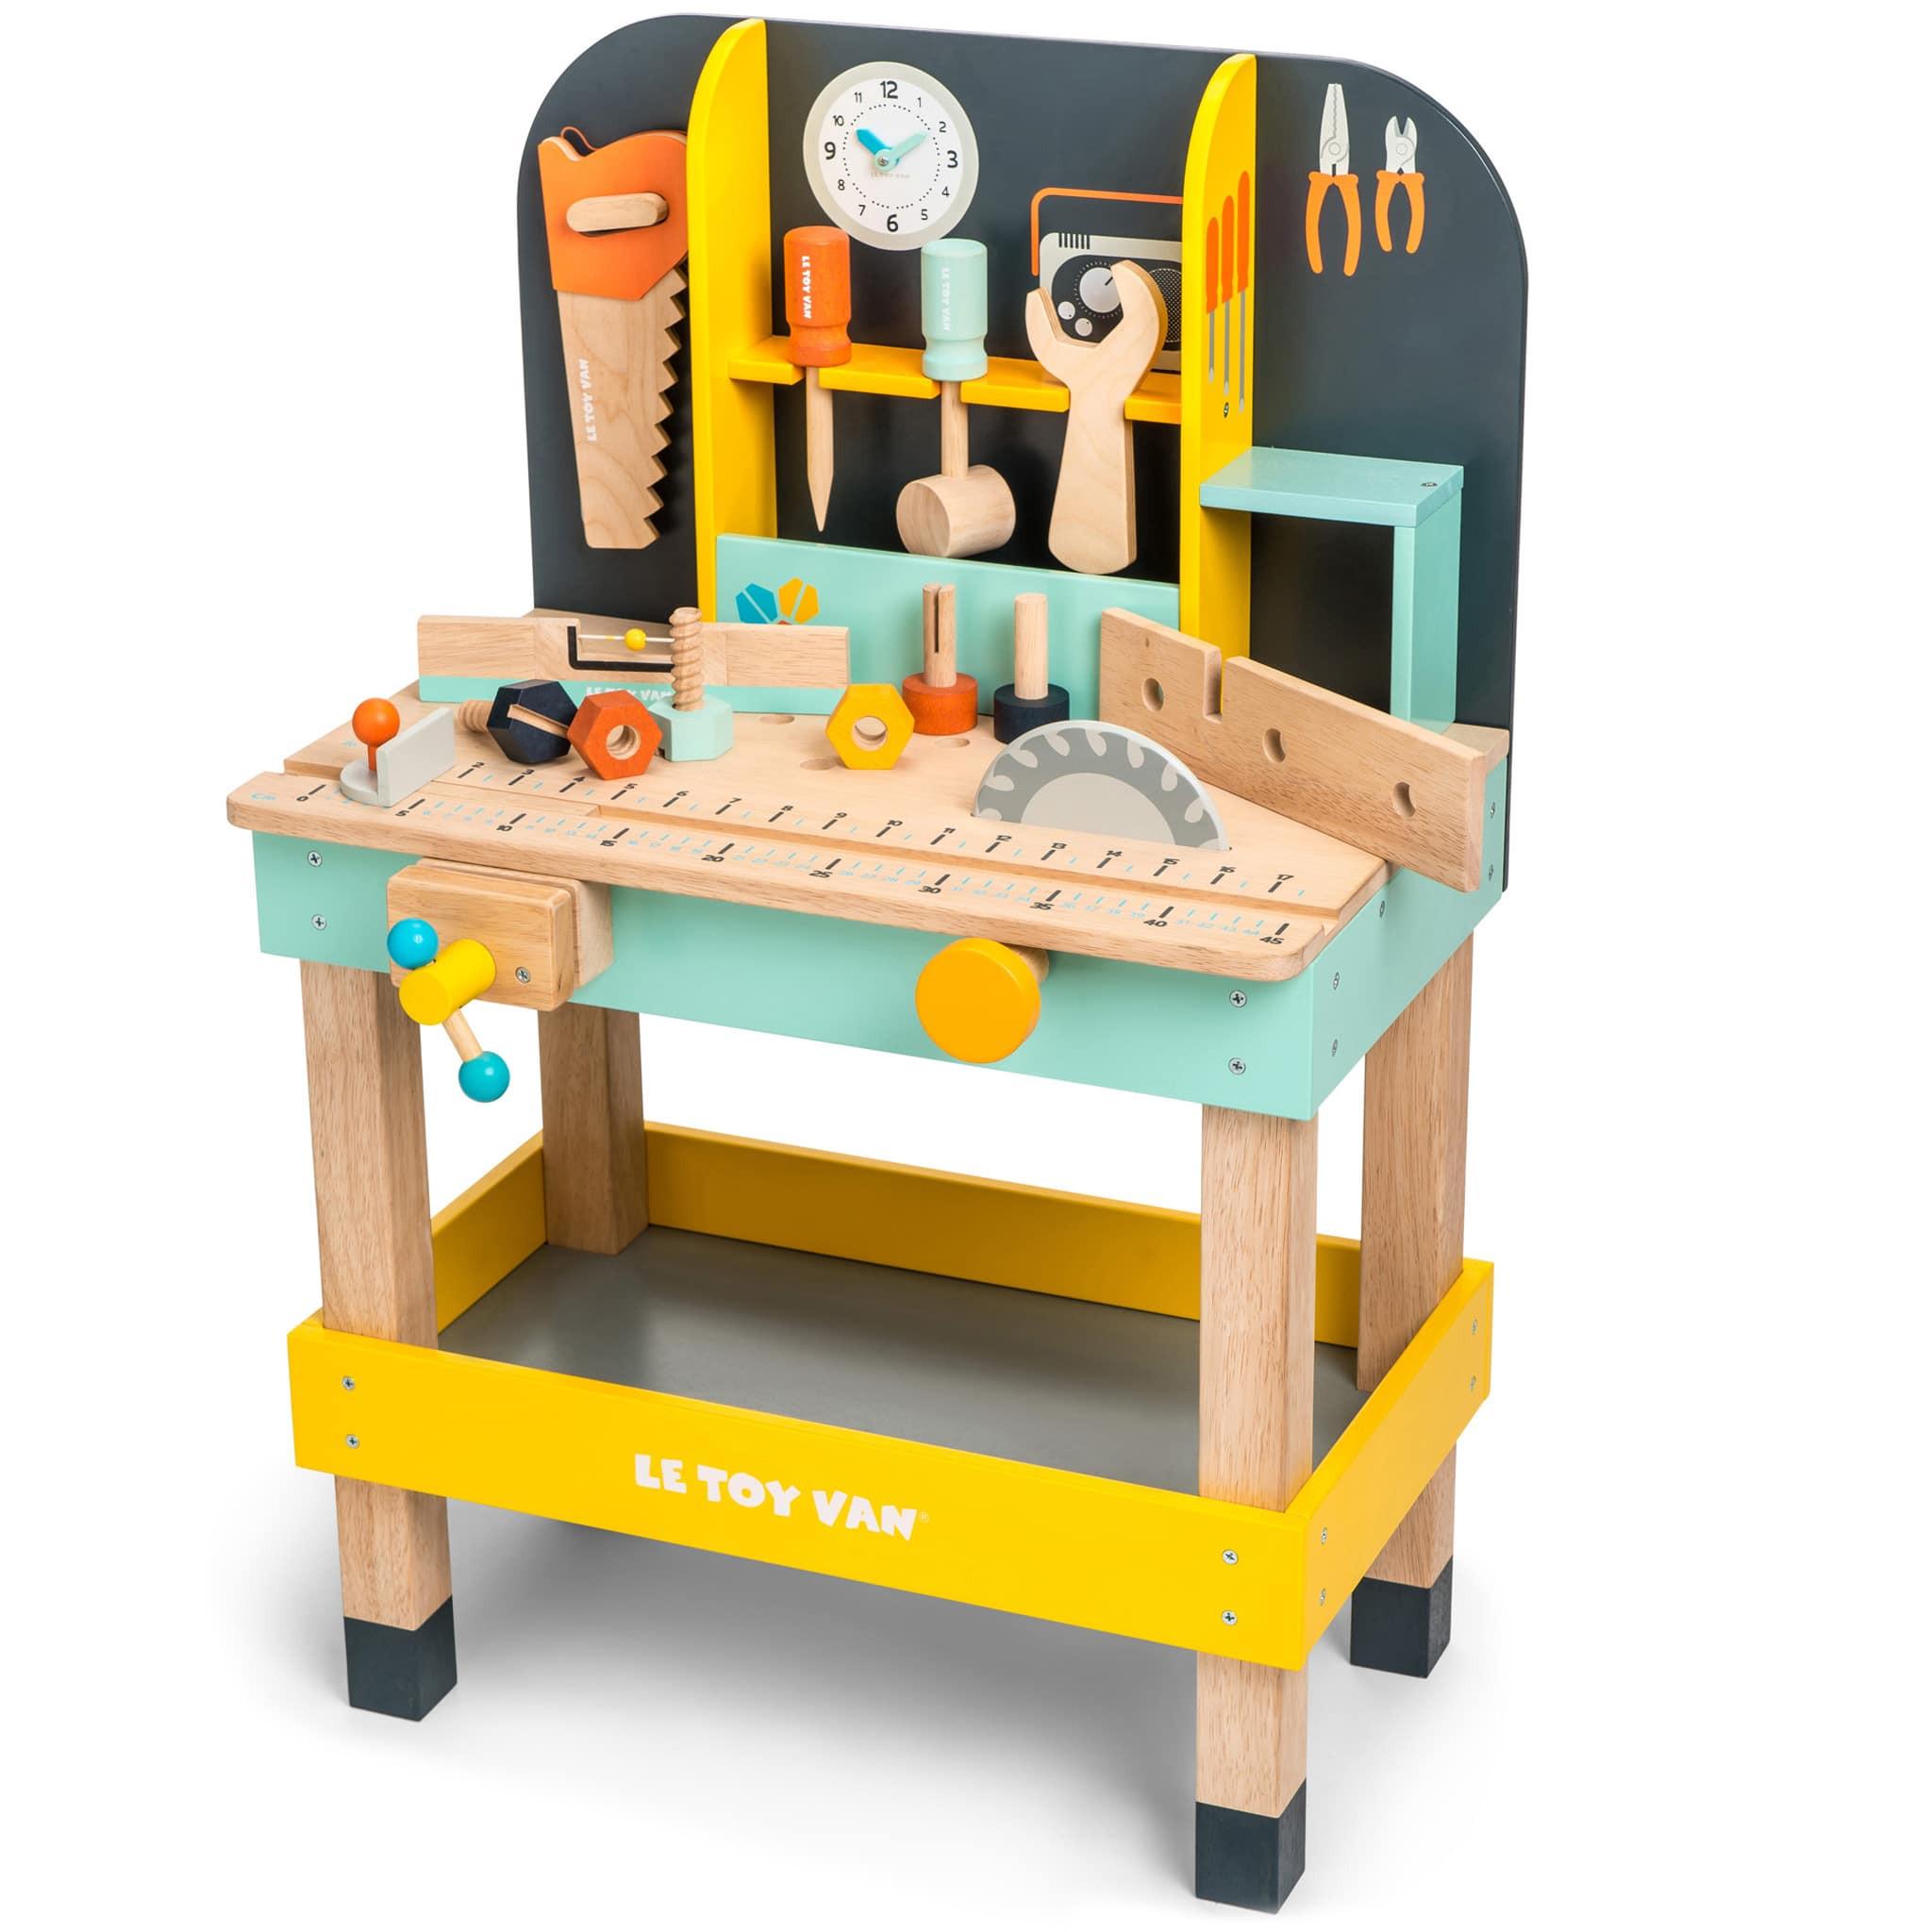 Banco da Lavoro Le Toy Van